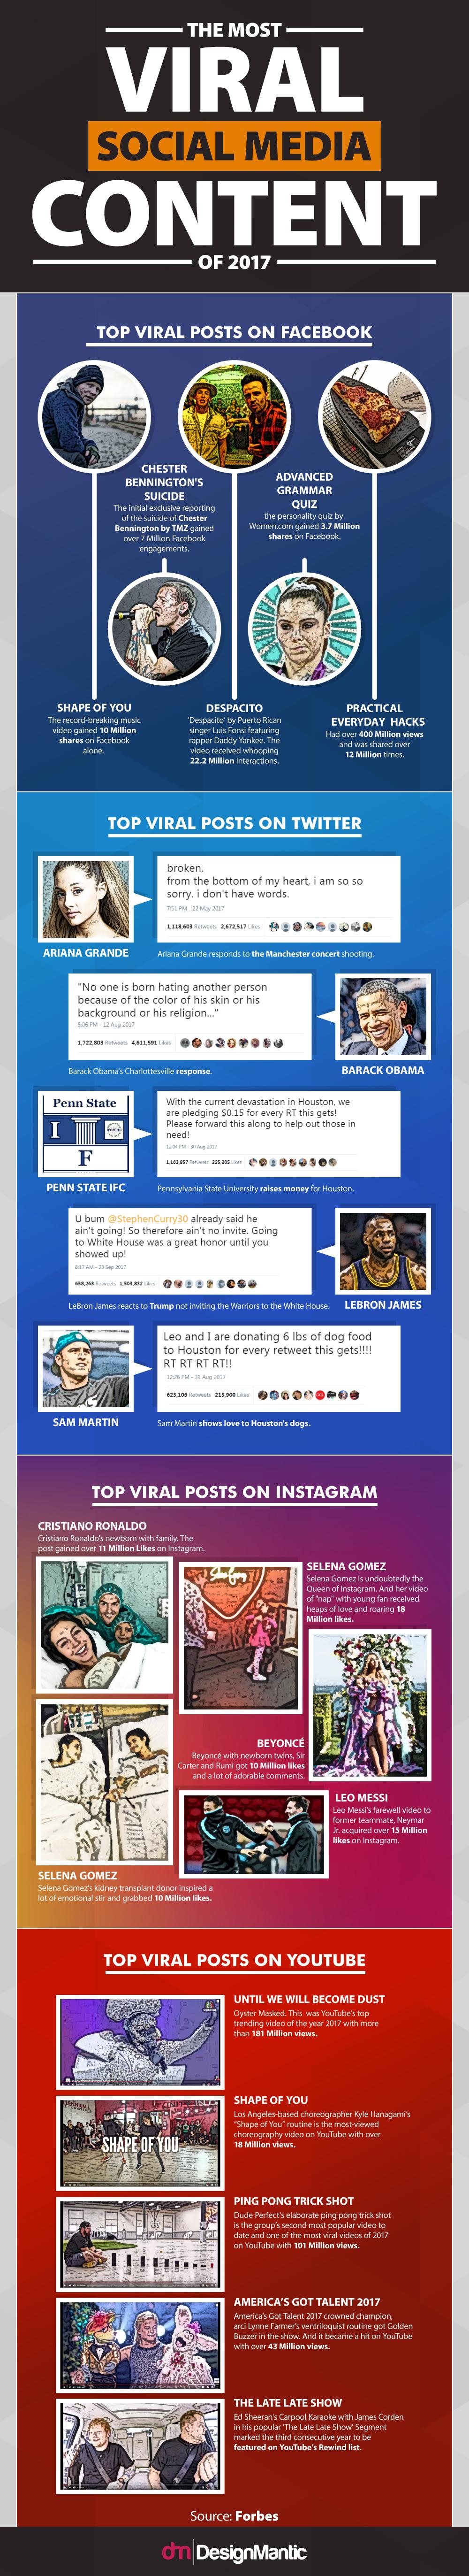 Viral Social Media content 2017